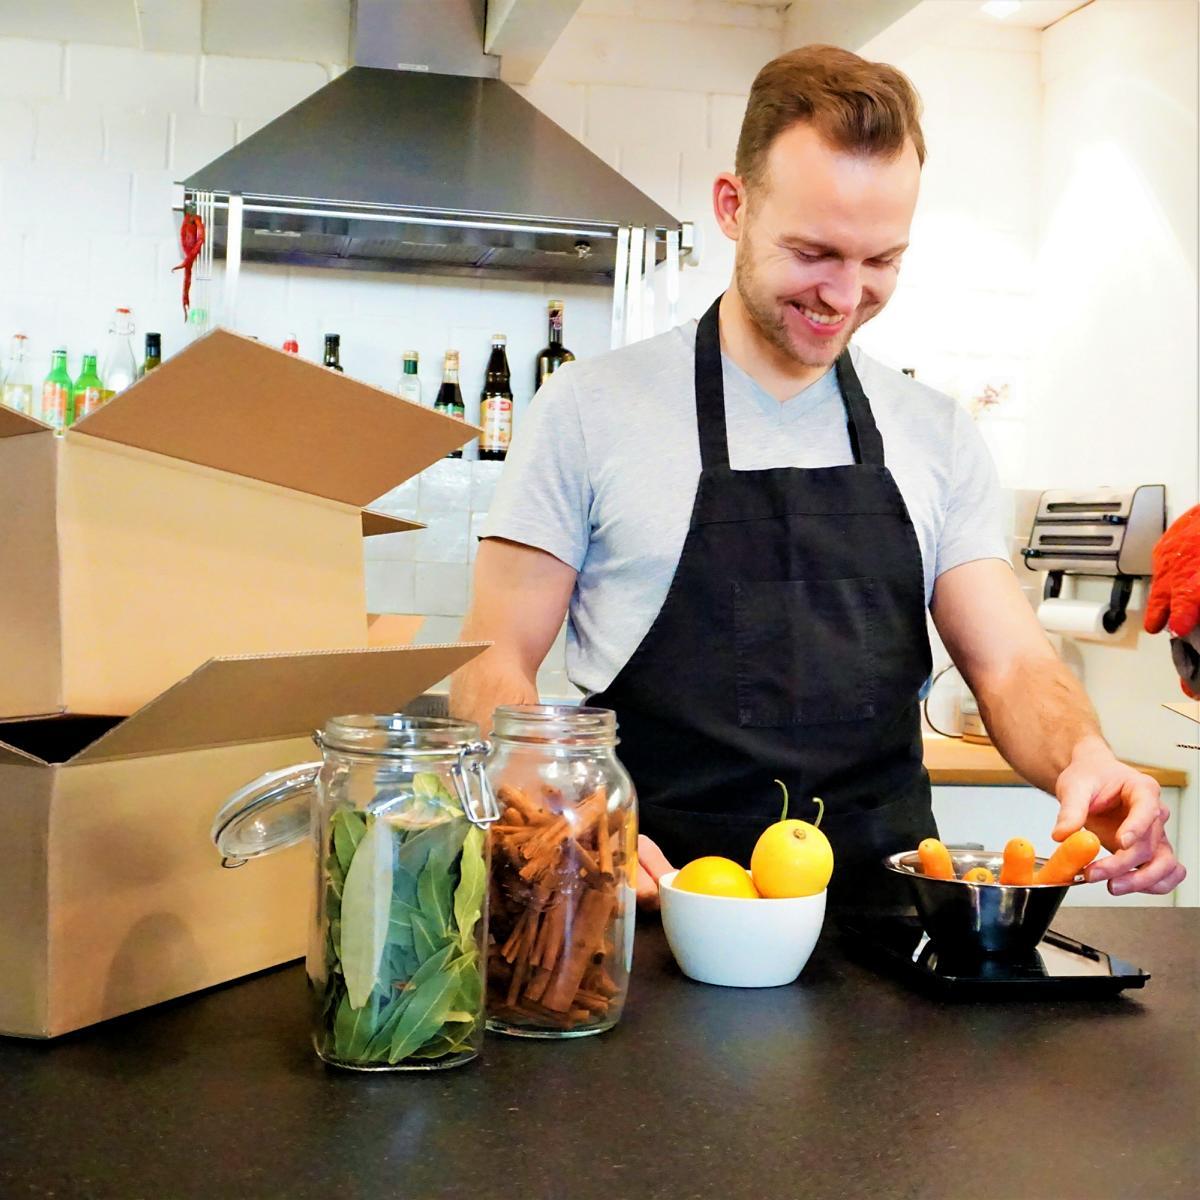 Style Hannover minzblatt Kochbox B - minzblatt - Kochboxen für zu Hause